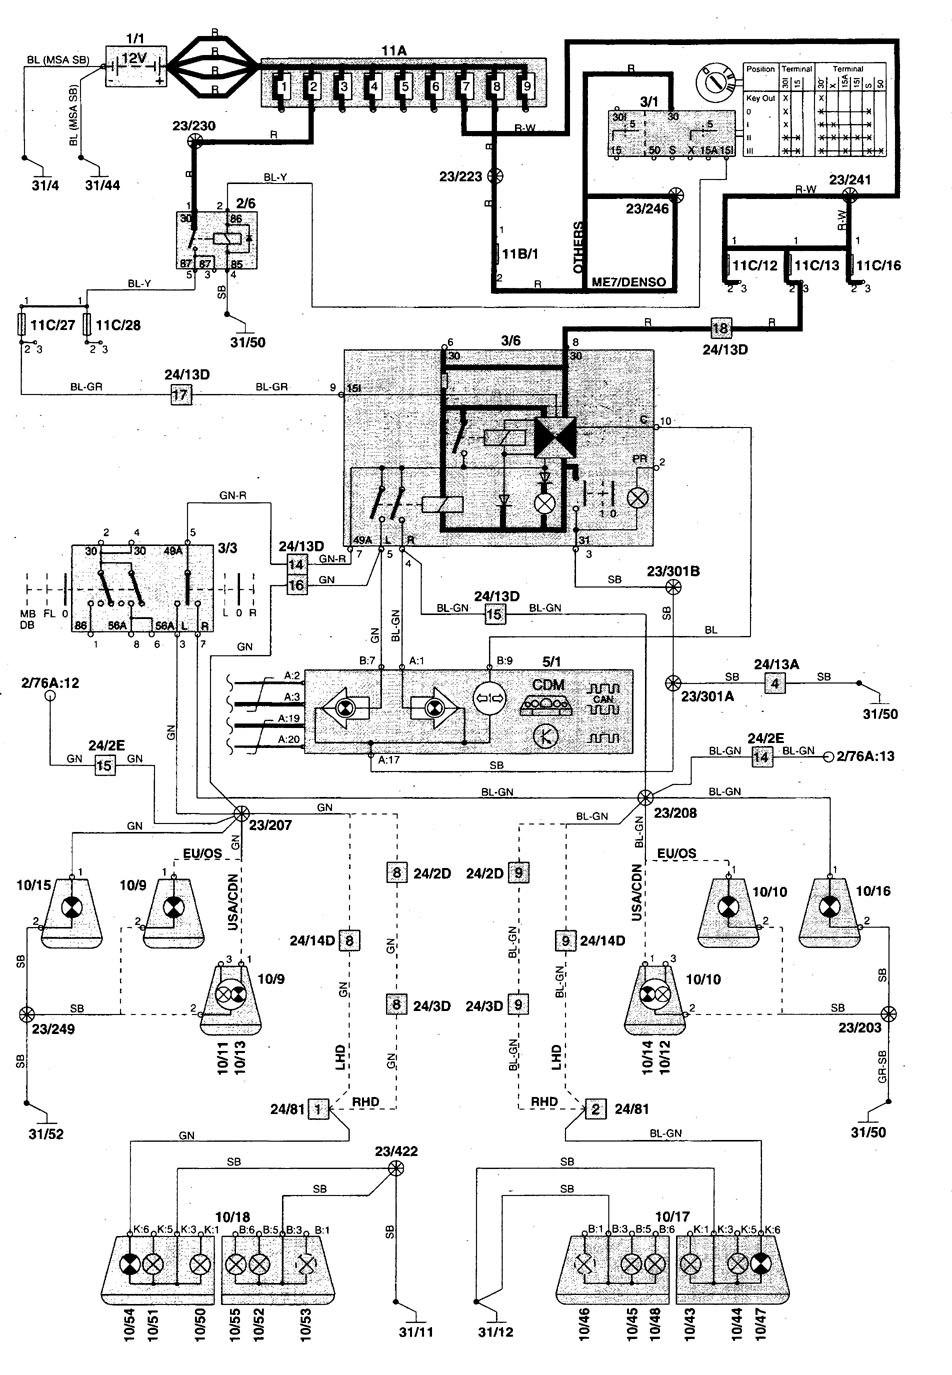 volvo wg64 wiring diagram wiring diagram Volvo S40 Timing Marks Diagram diagrams s60 volvo wiring 2000 volvo truck electrical wiring wiring diagram2000 volvo truck electrical wiring 2000 volvo truck stereo wiringsmall